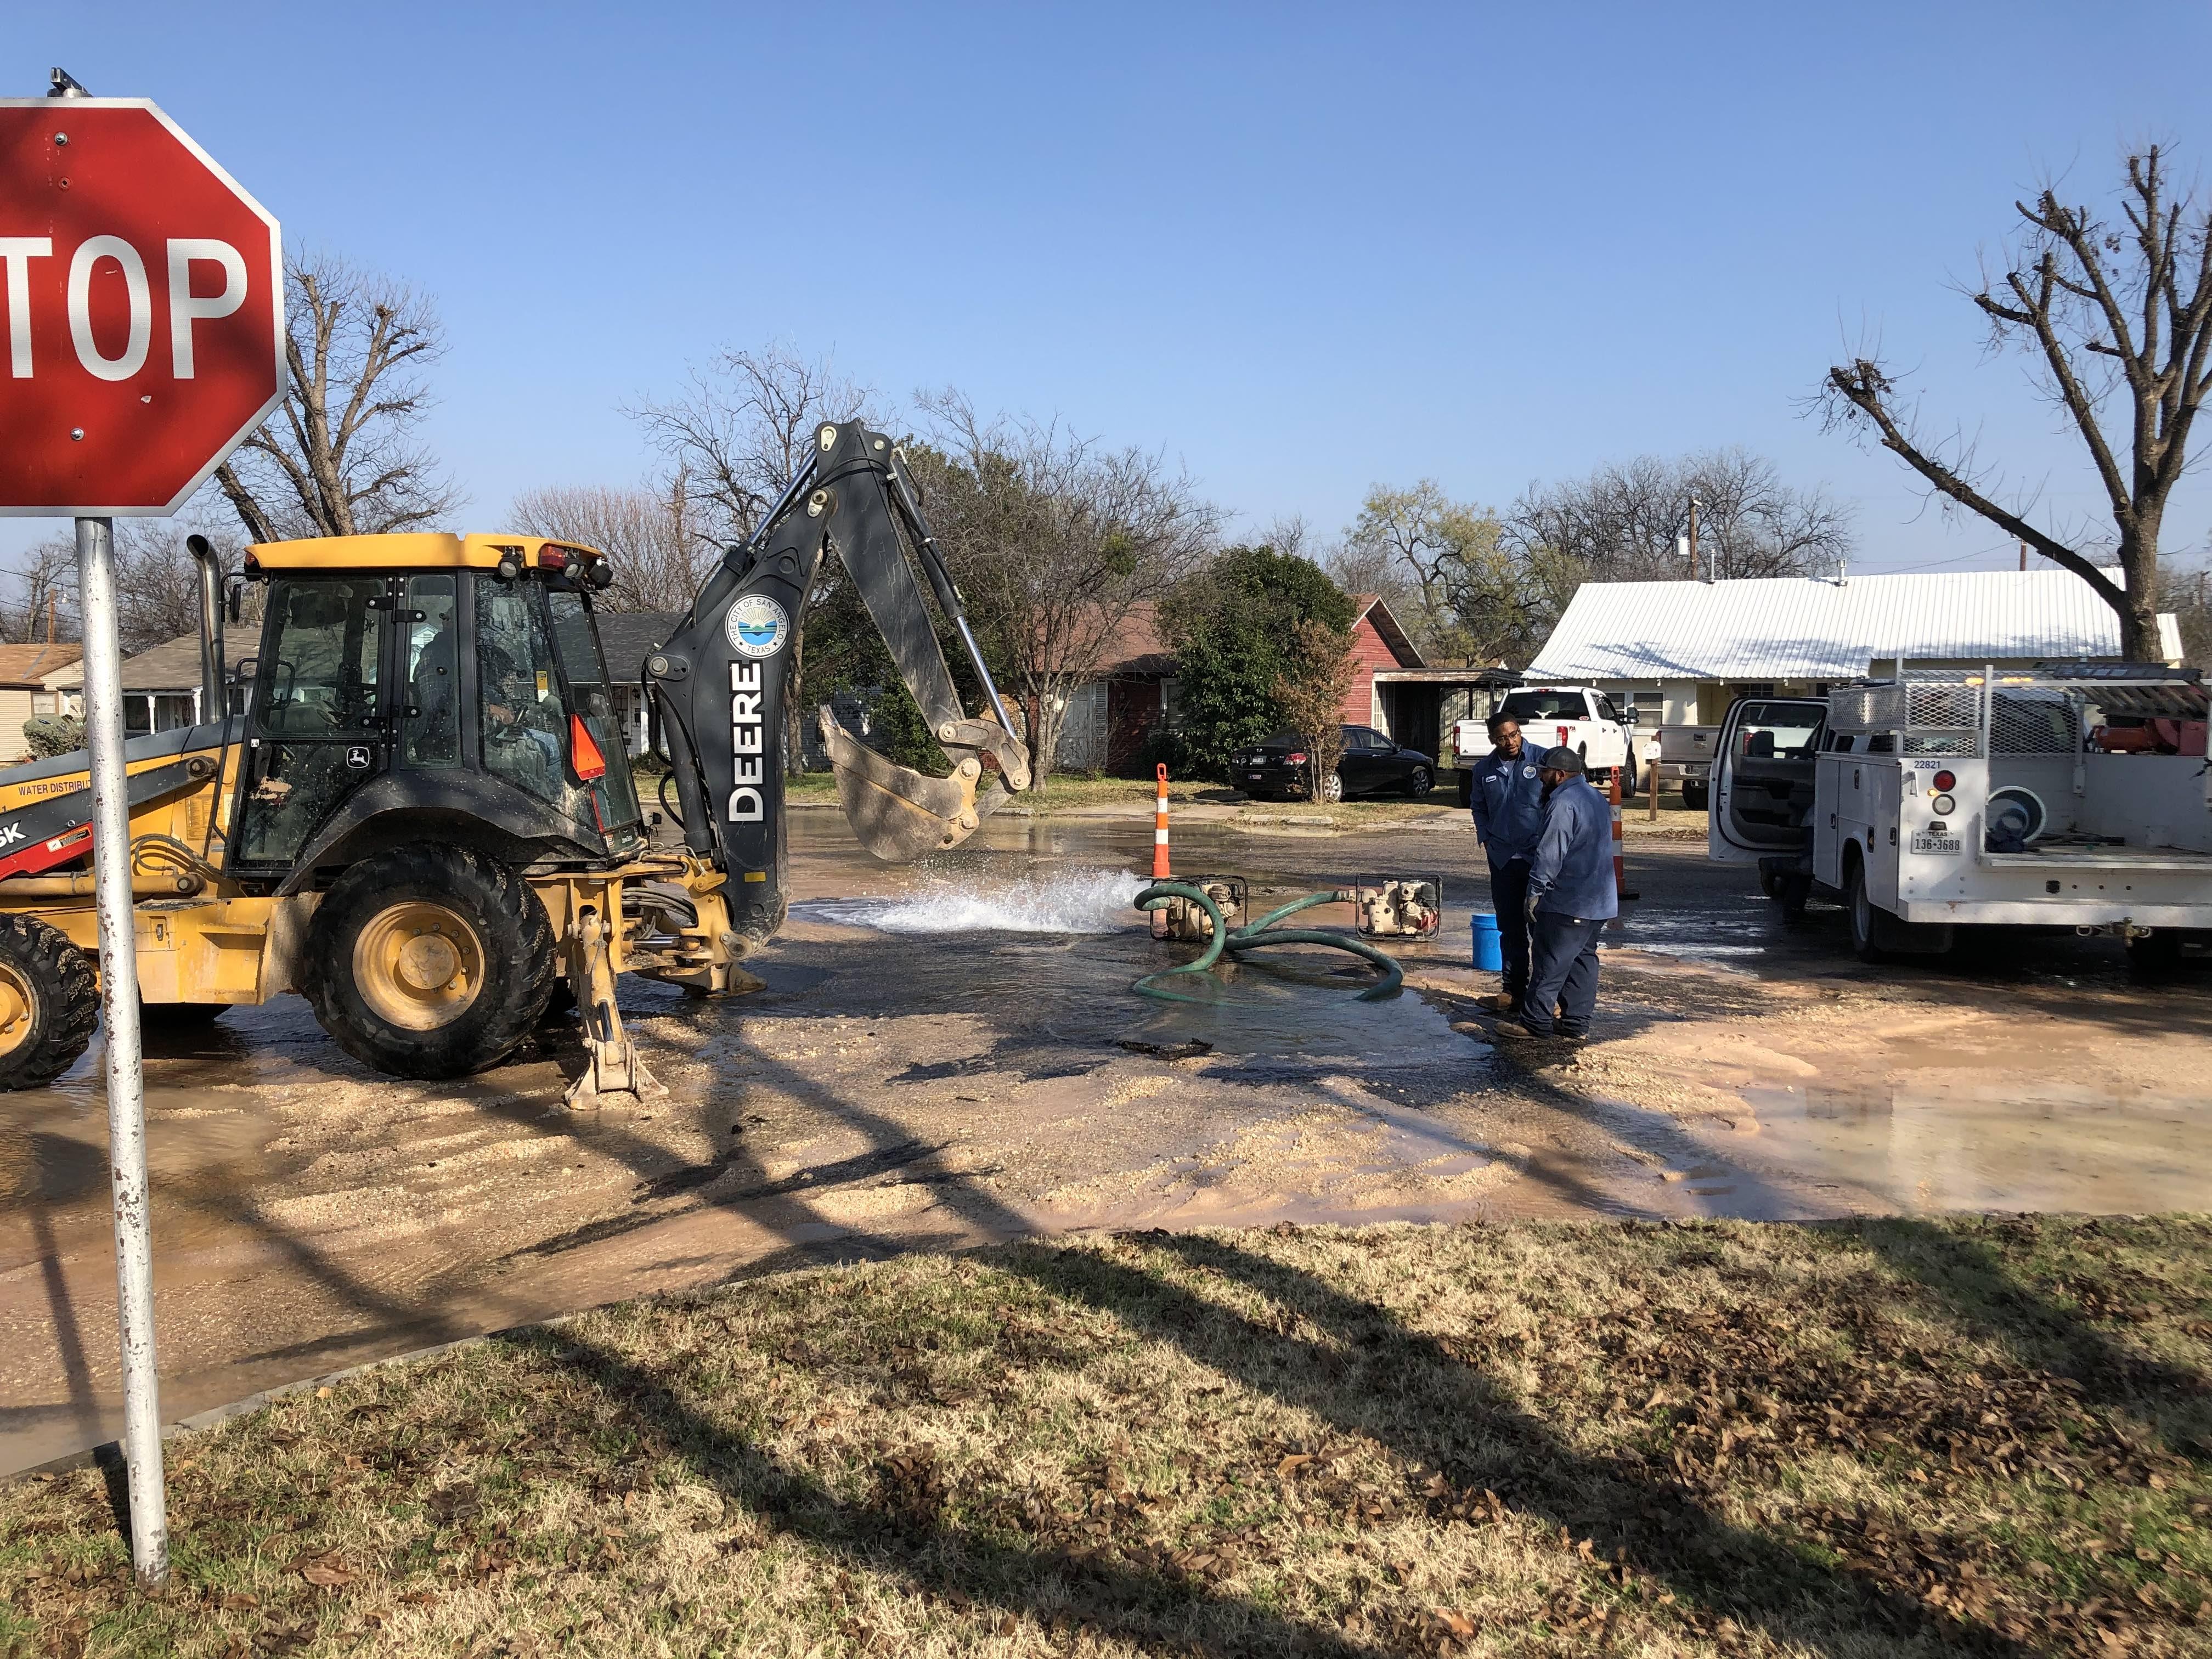 City crews are working on a purported water main break beneath S. Taylor St. in Santa Rita on Dec. 10, 2018. (LIVE! Photo/Joe Hyde)